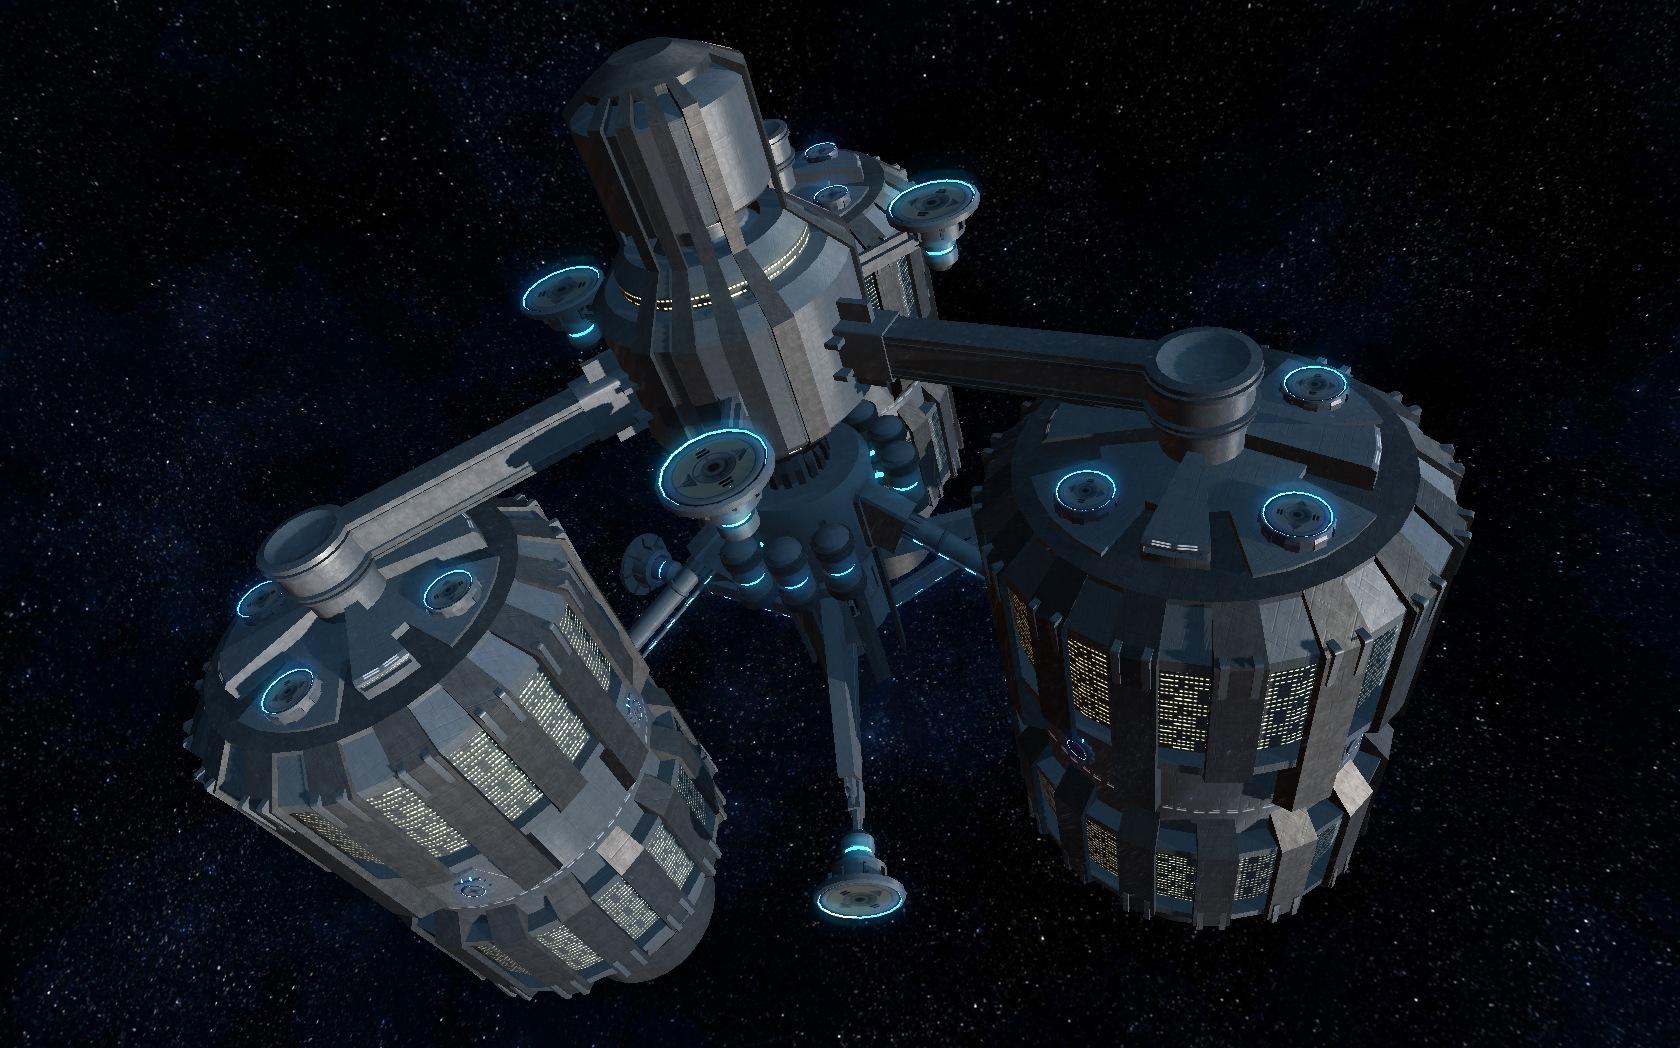 prison space station - photo #10